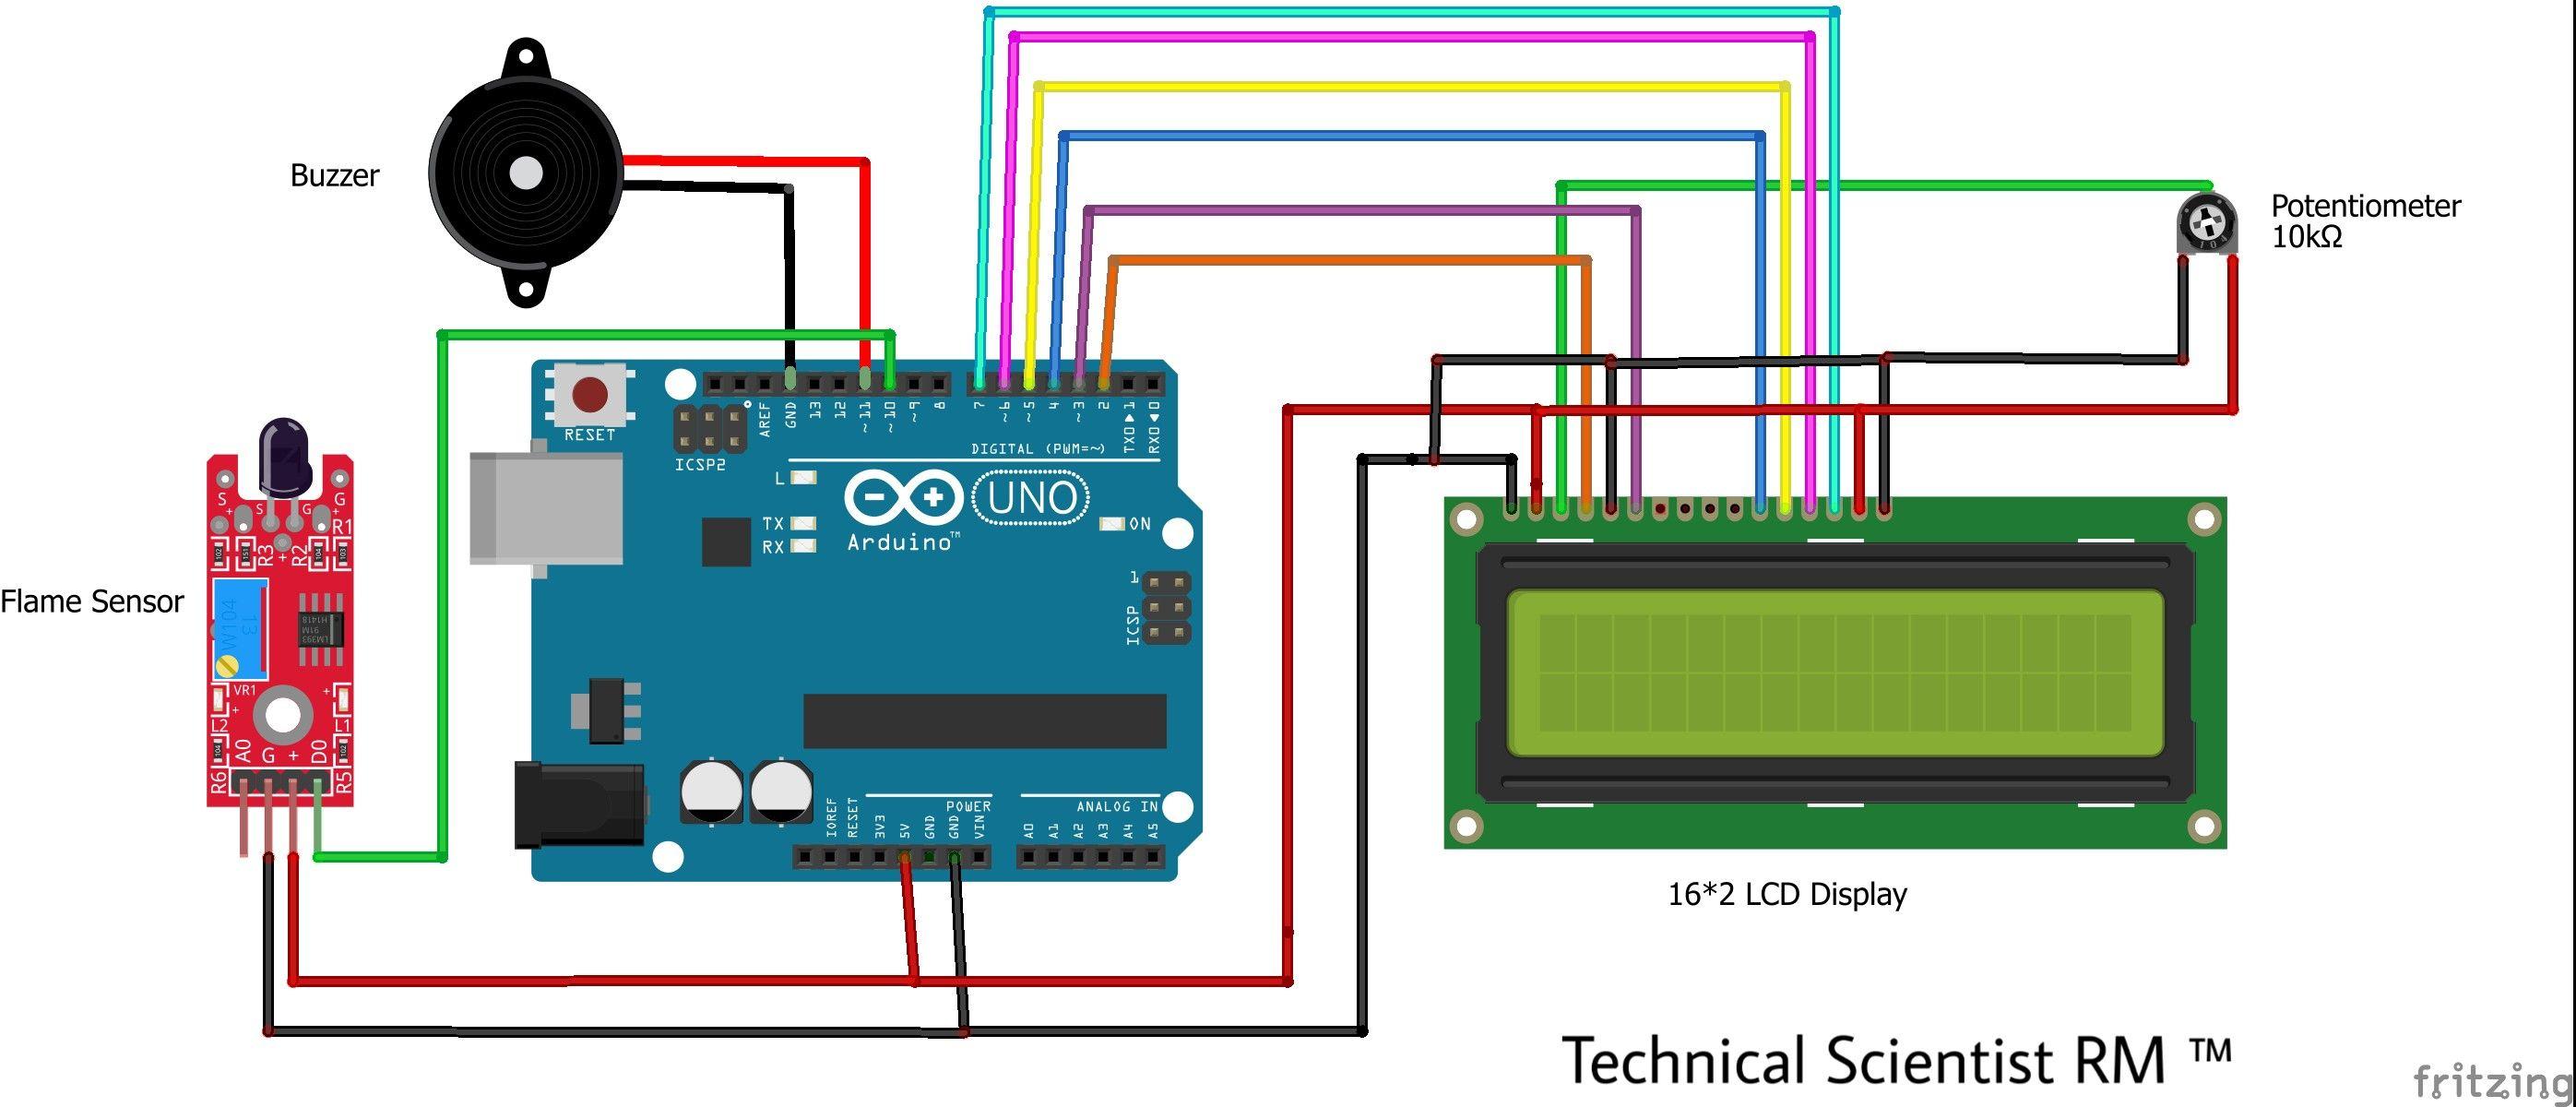 Fire Alarm Using Flame Sensor Lcd Display 16 2 Arduino Sensor Fire Alarm Arduino